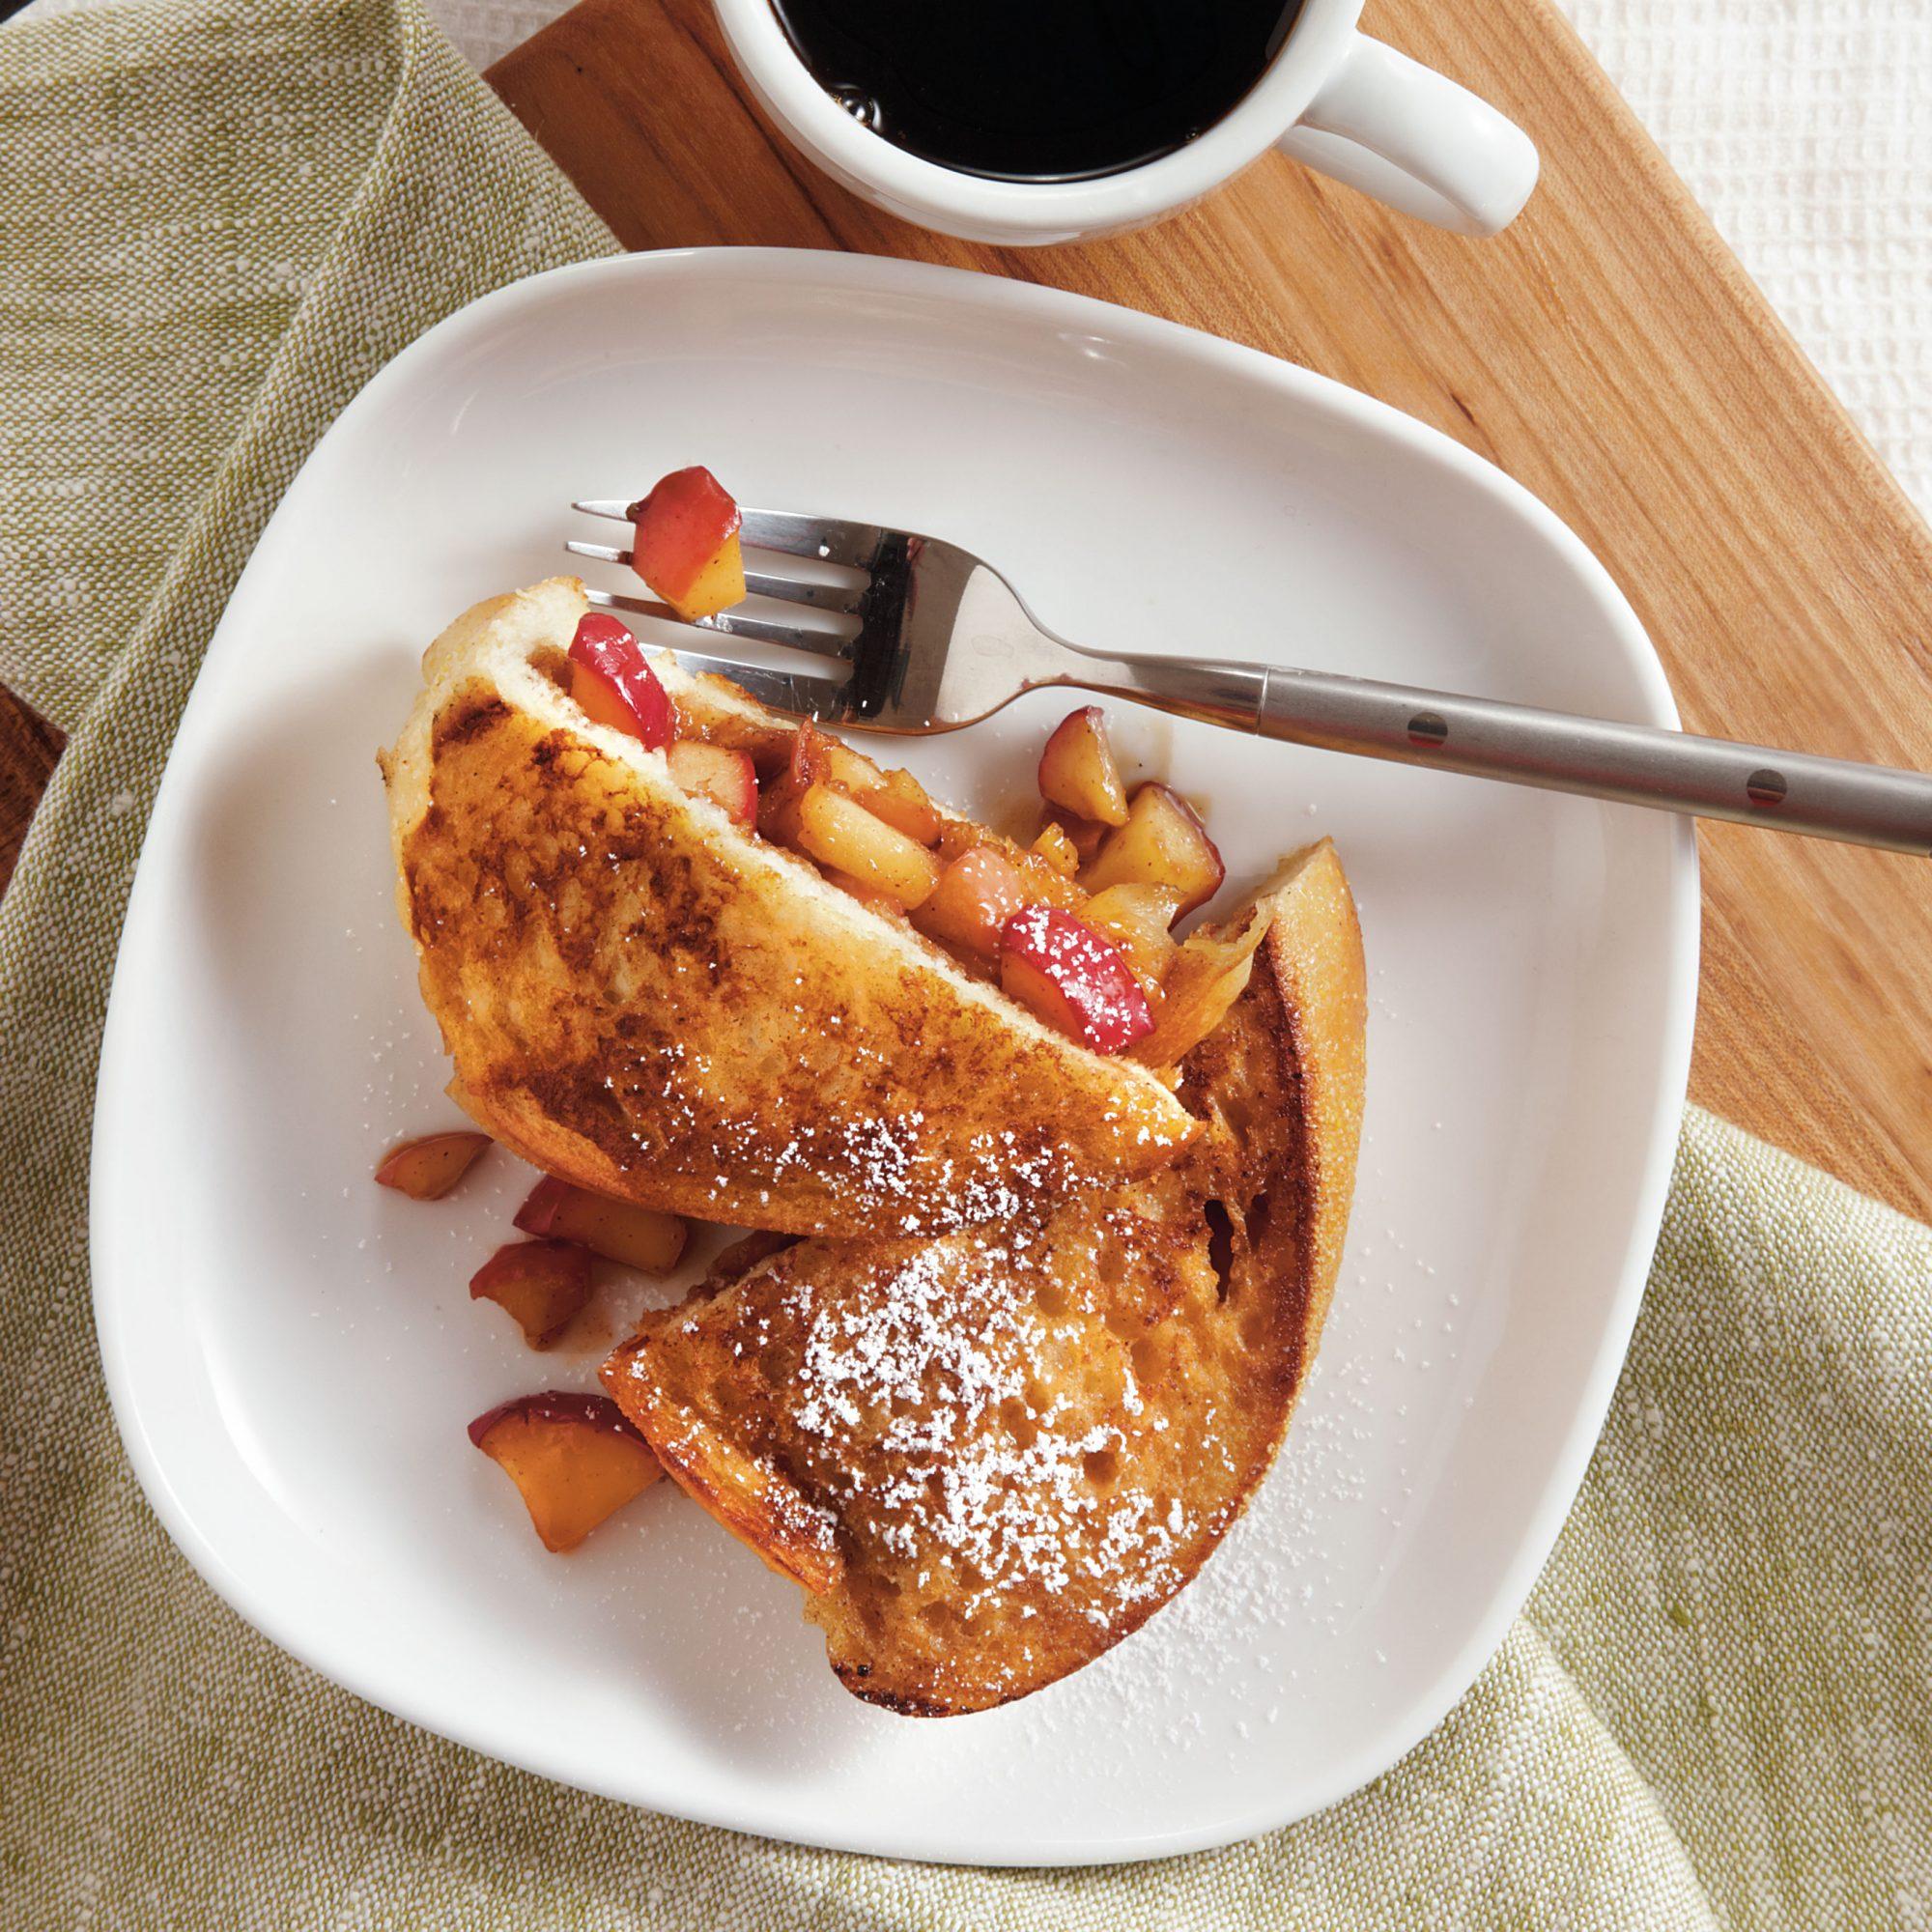 cinnamon apple stuffed french toast recipe myrecipes. Black Bedroom Furniture Sets. Home Design Ideas